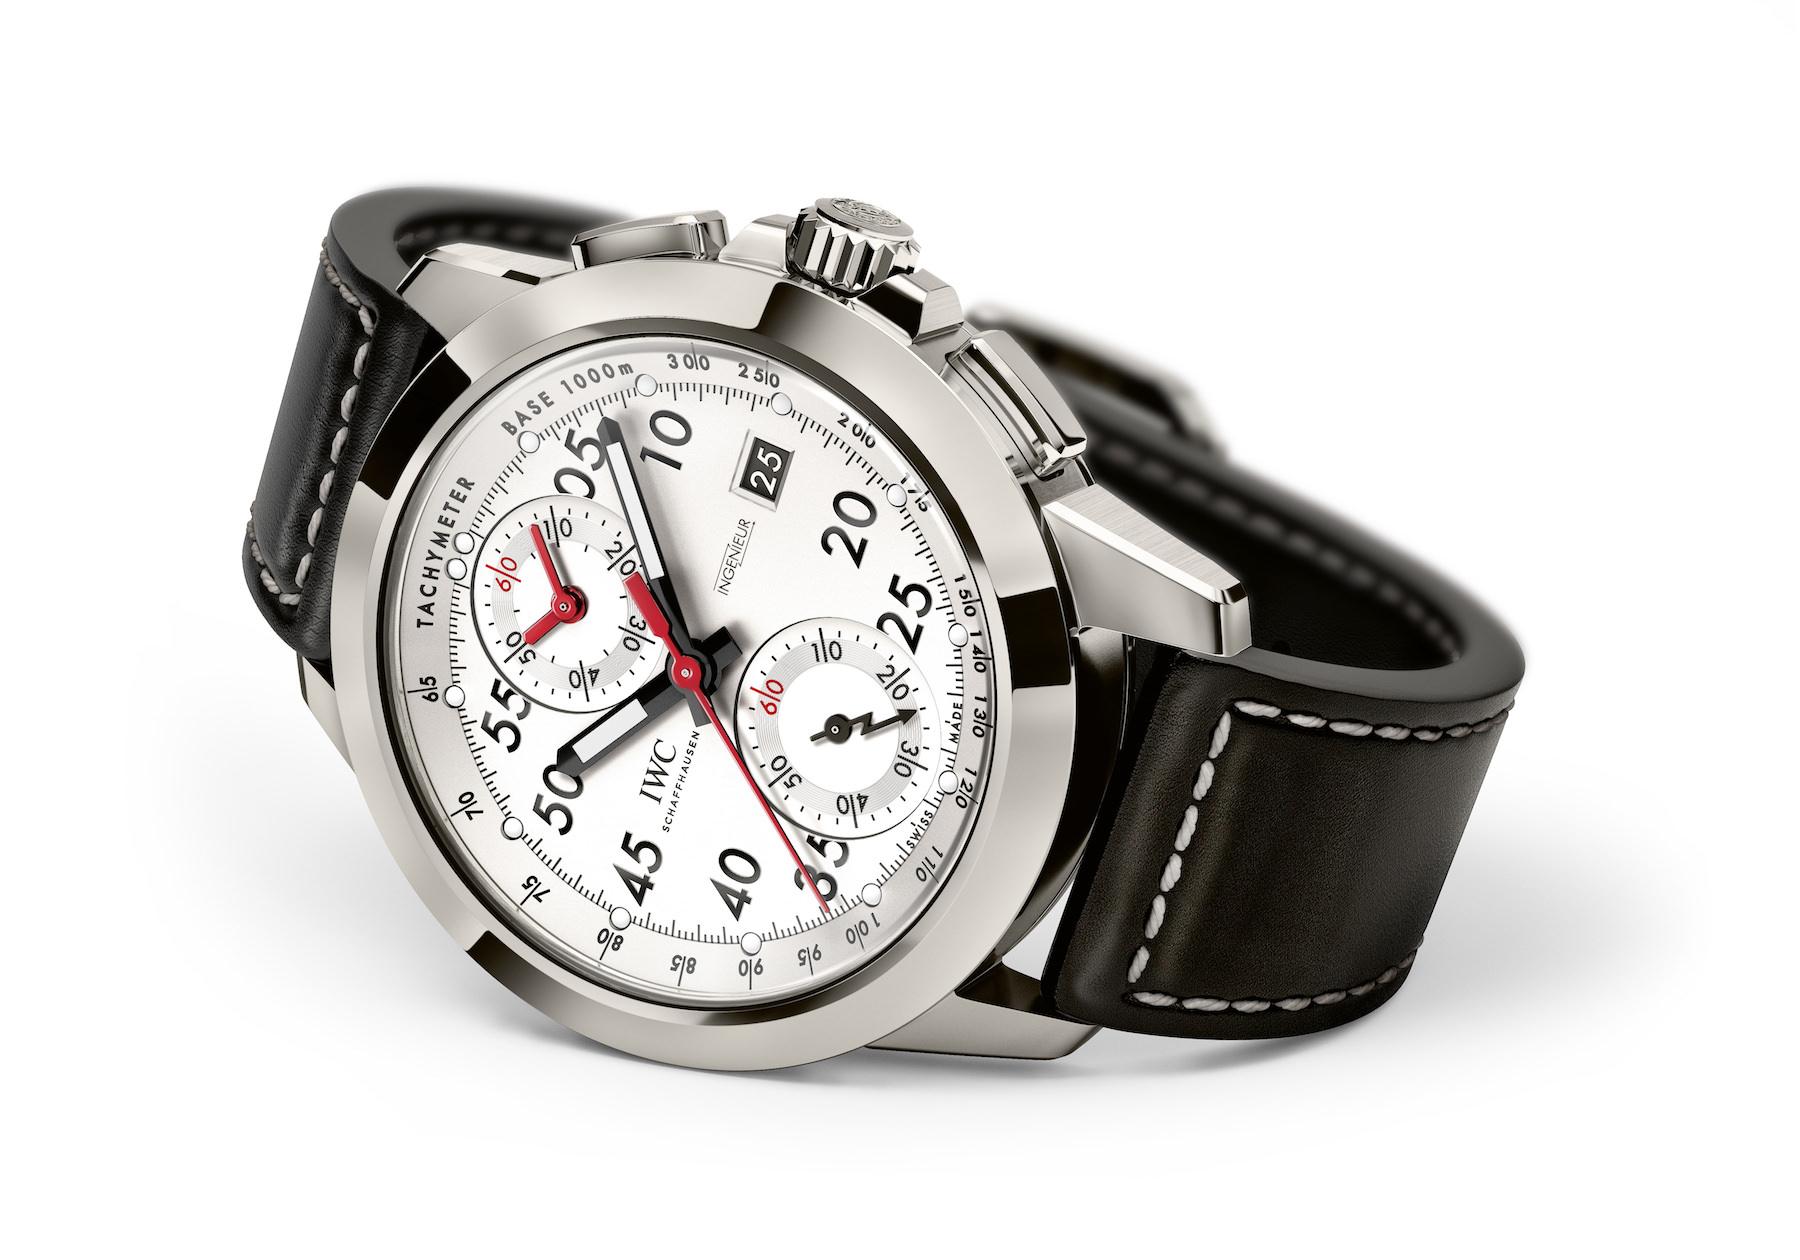 Die IWC Ingenieur Chronograph Sport AMG